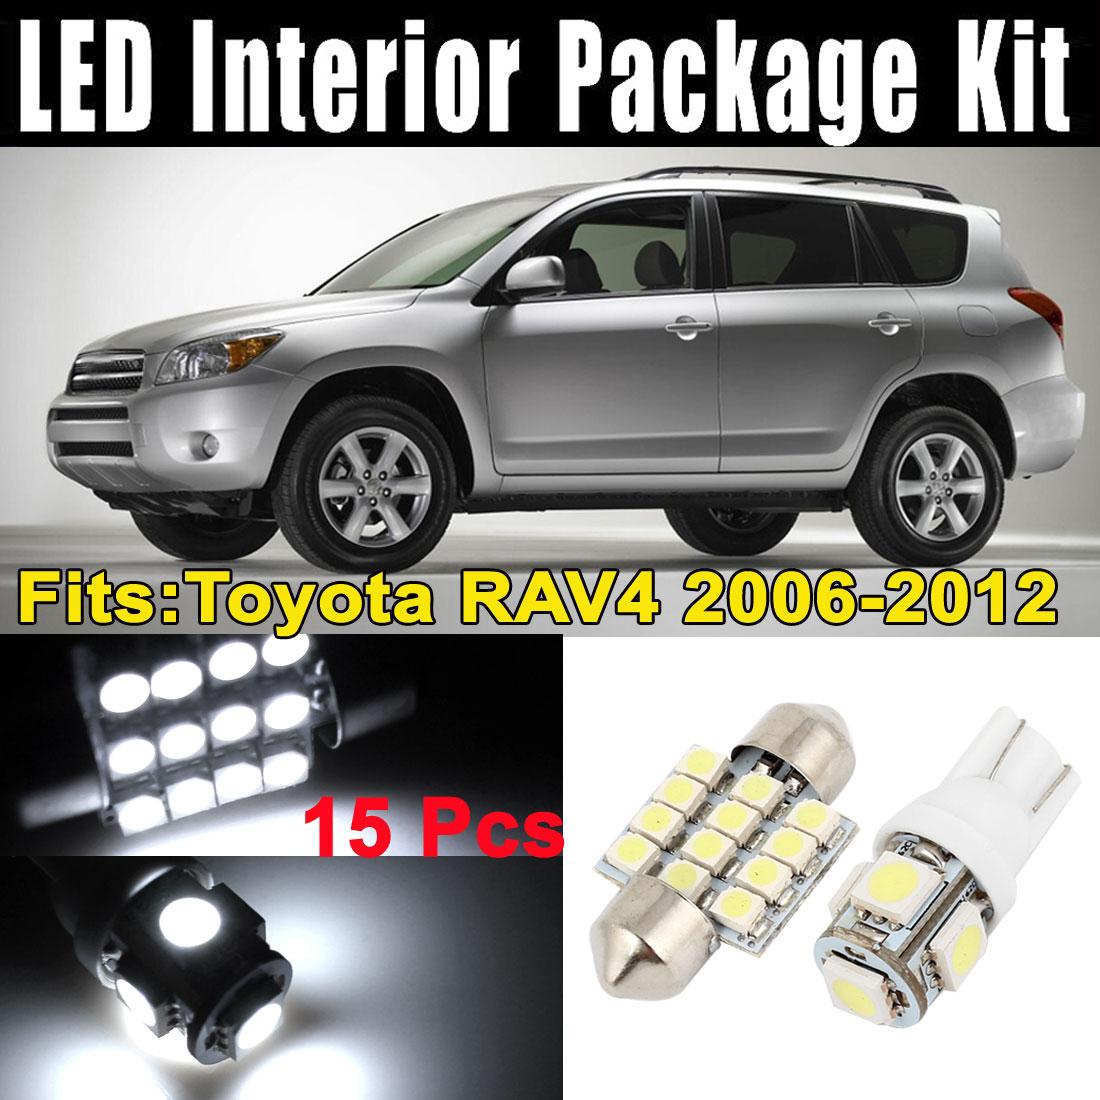 15Pcs LED Lights Interior White Dome Map Lamp Kit for Toyota RAV4 2006-2012 (7xT10-5-5050+8x31MM-12-3528)